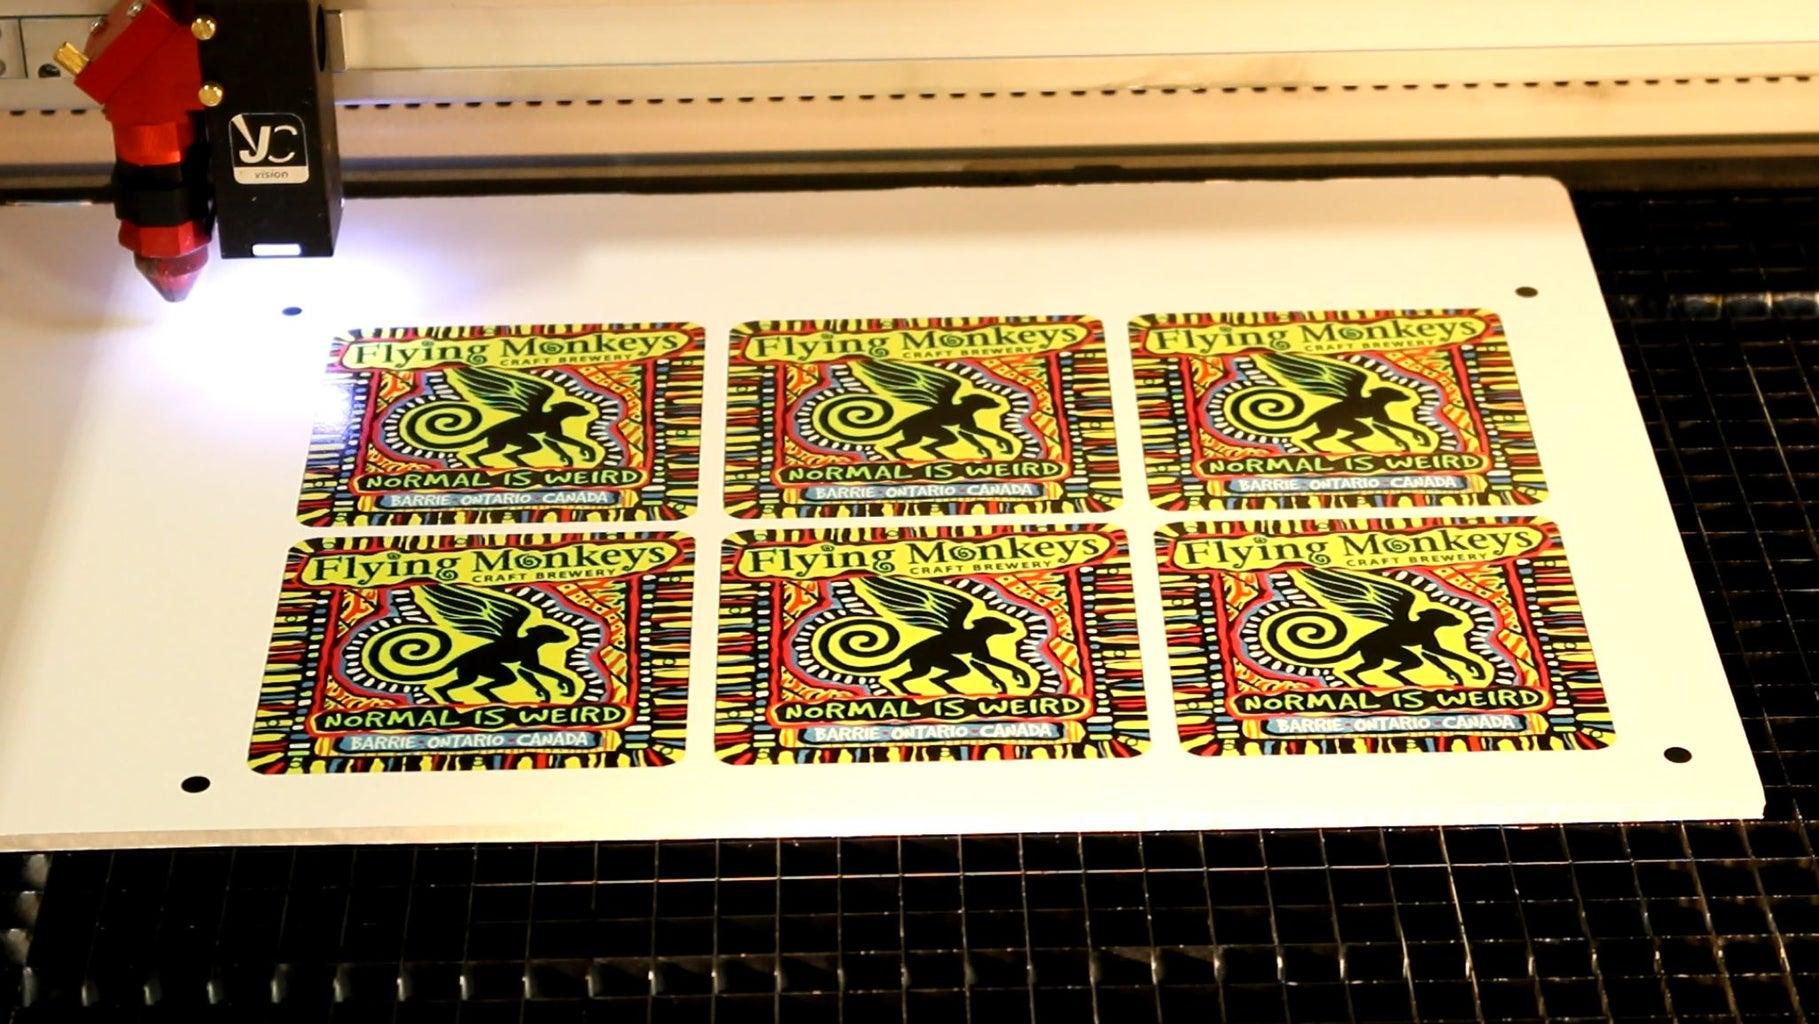 Coaster 8: Flying Monkeys Craft Brewery